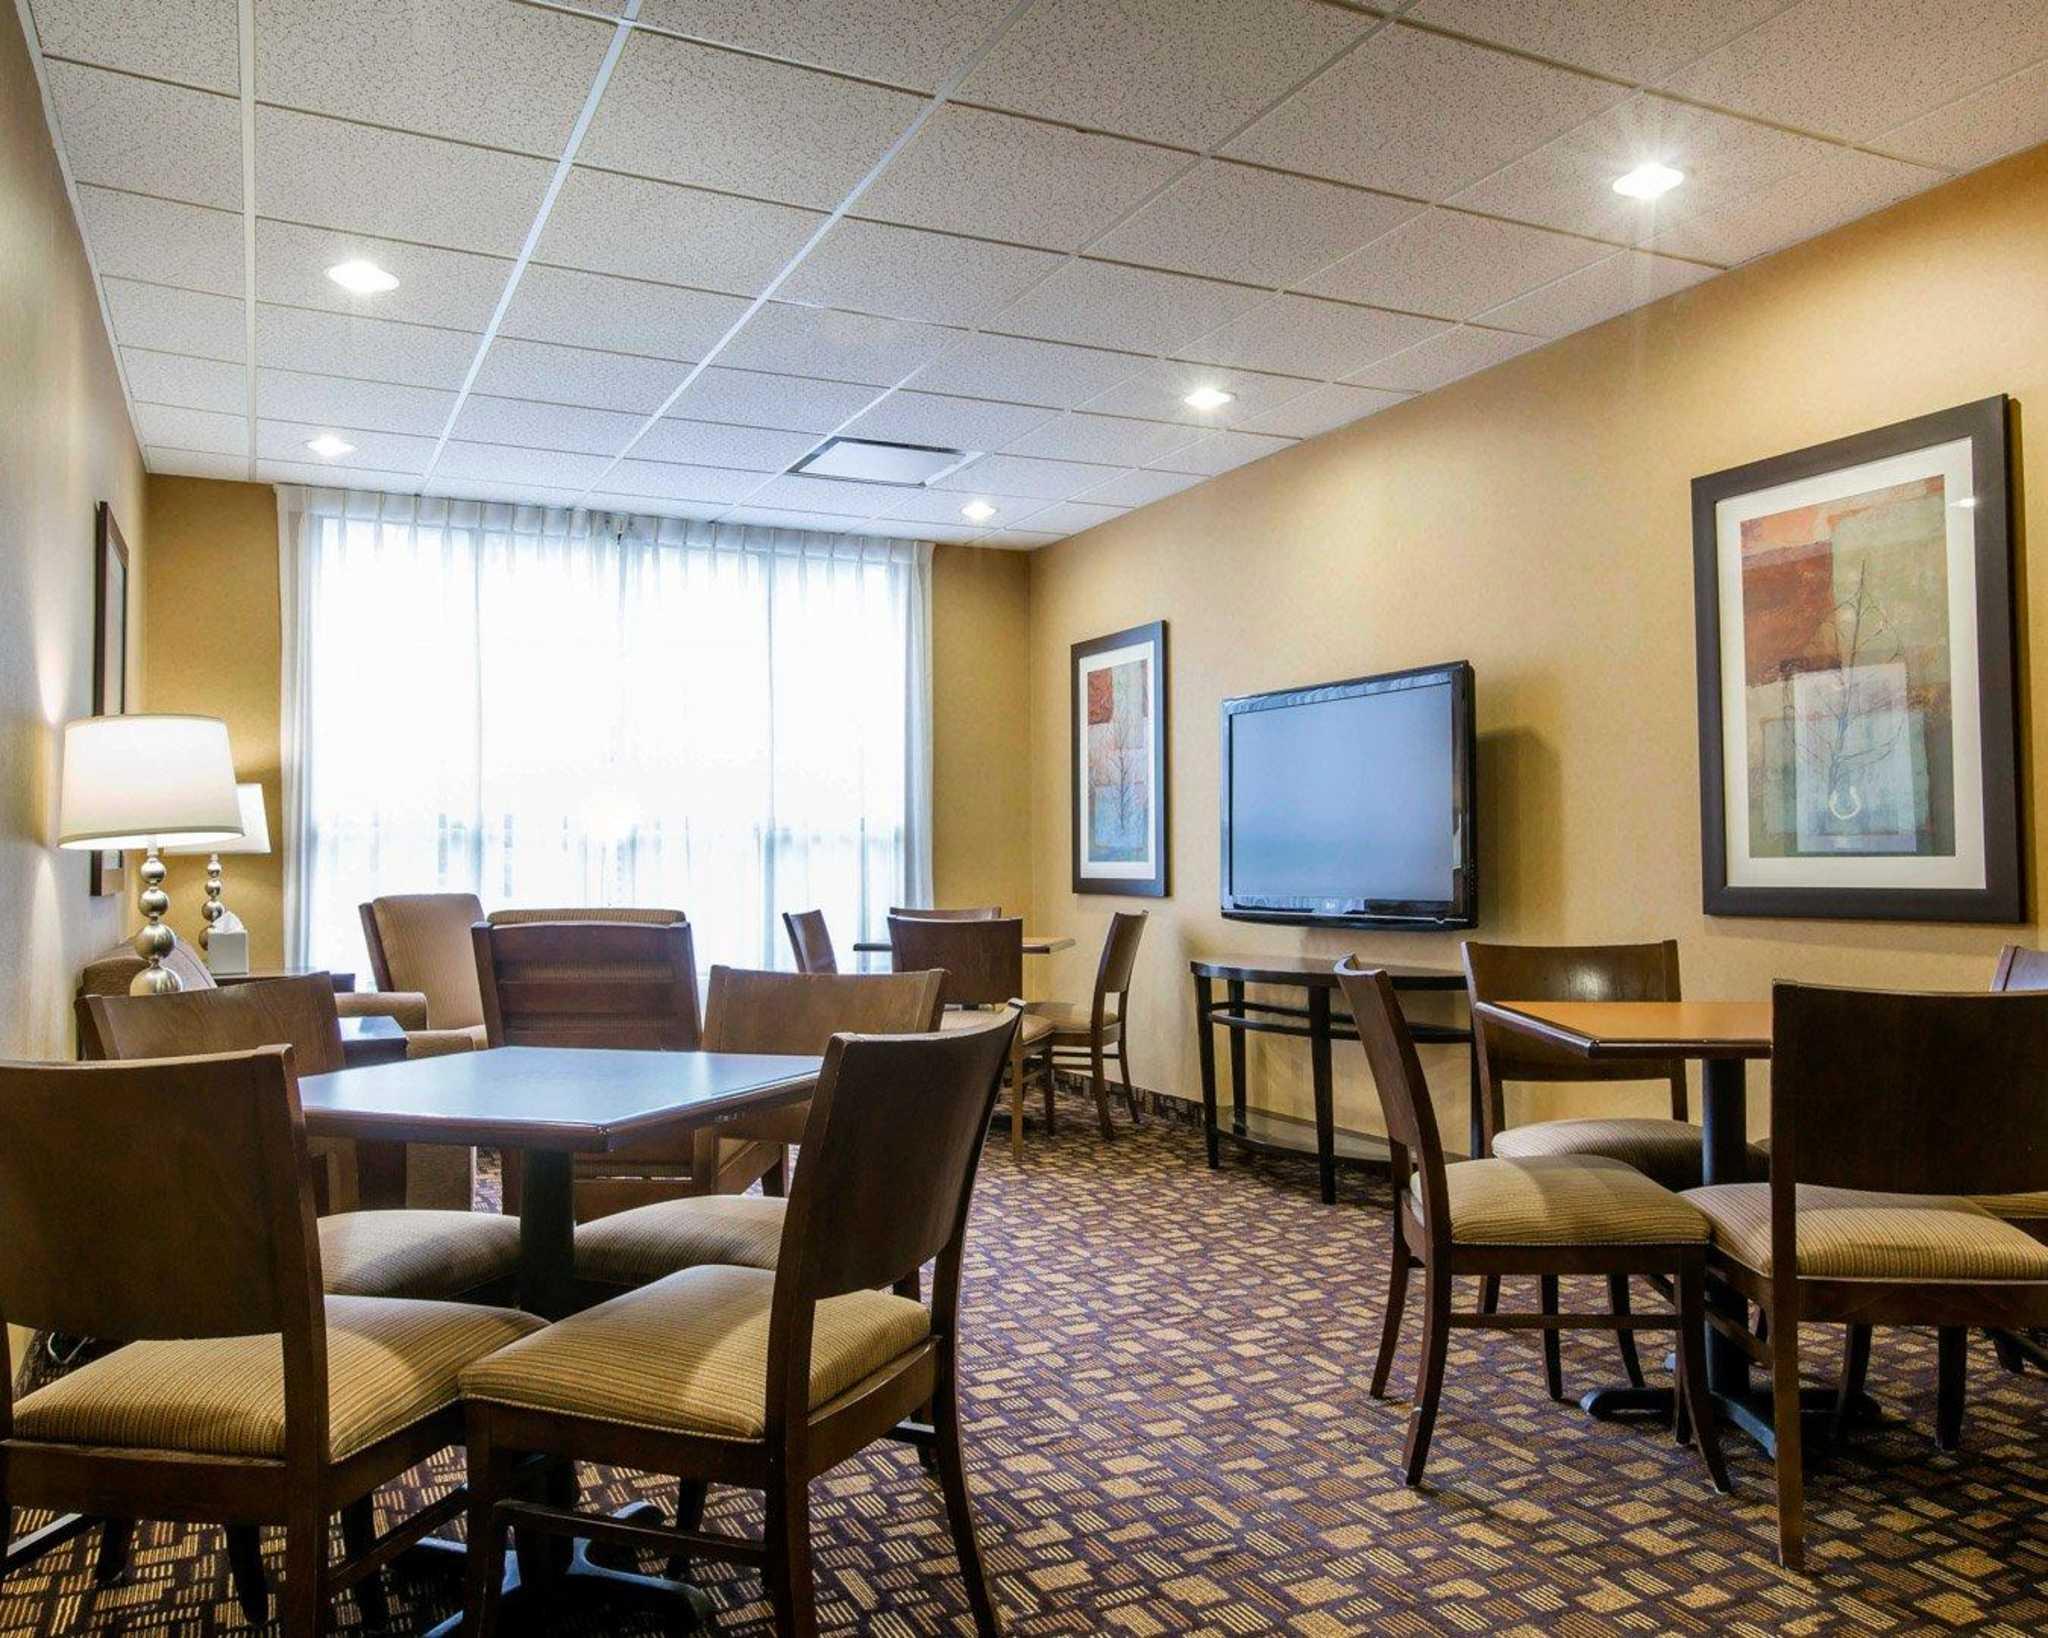 Comfort Inn & Suites adj to Akwesasne Mohawk Casino image 38